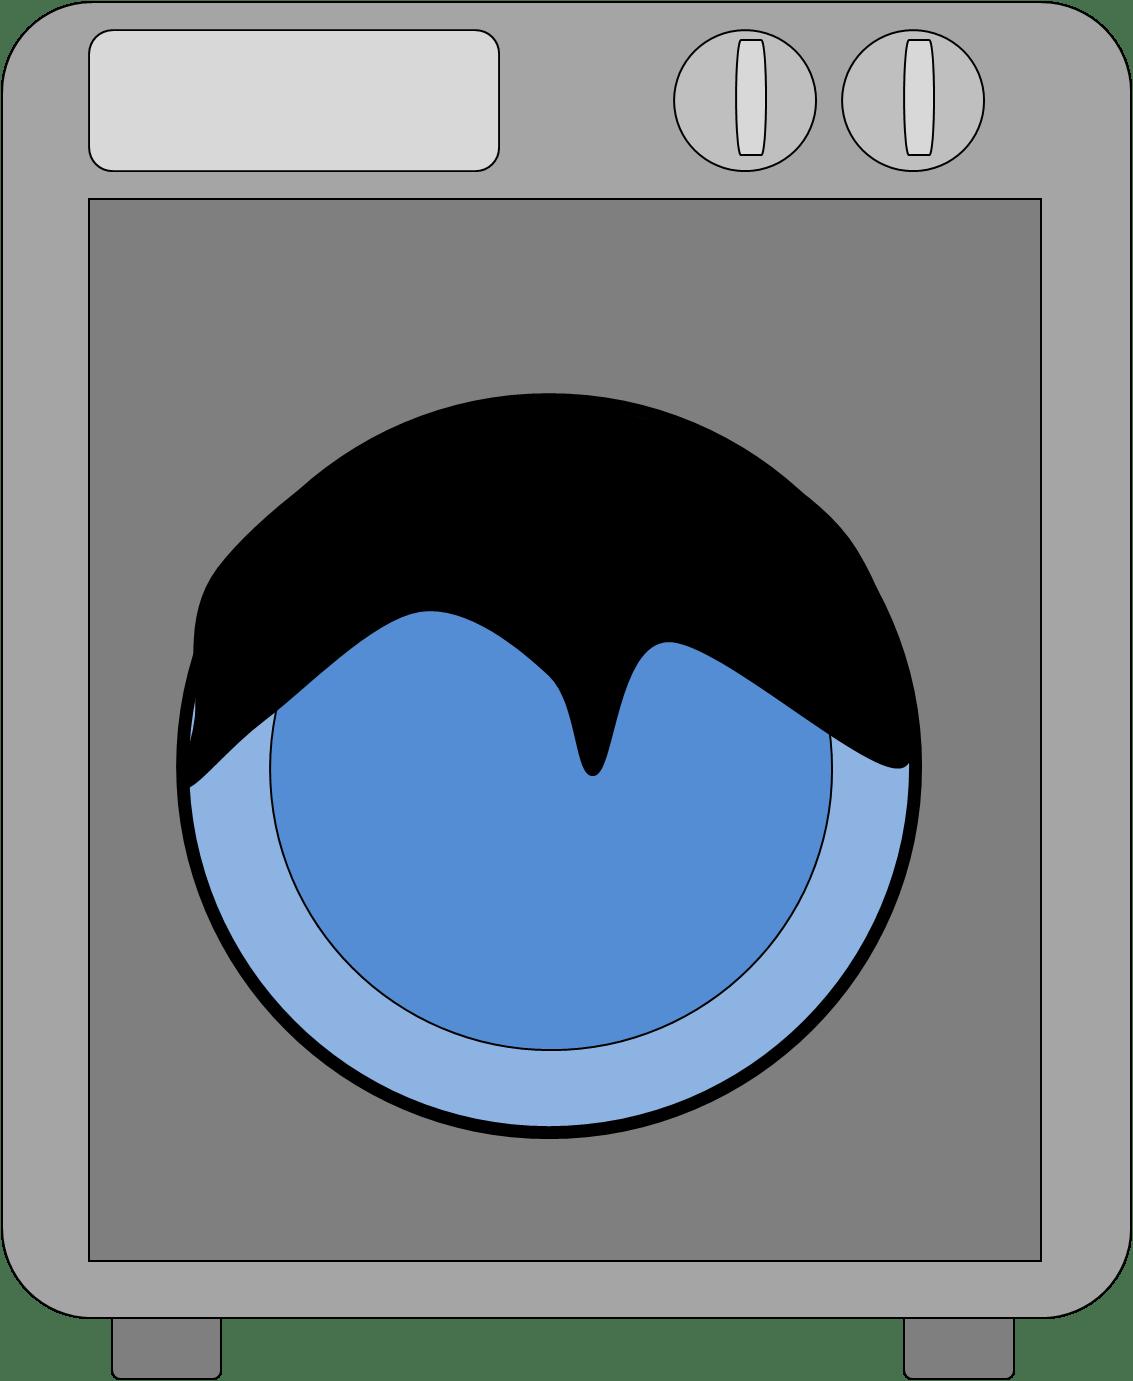 Vector Mesin Cuci : vector, mesin, Washing, Machine, Images, Clker.com, Vector, Online,, Royalty, Public, Domain